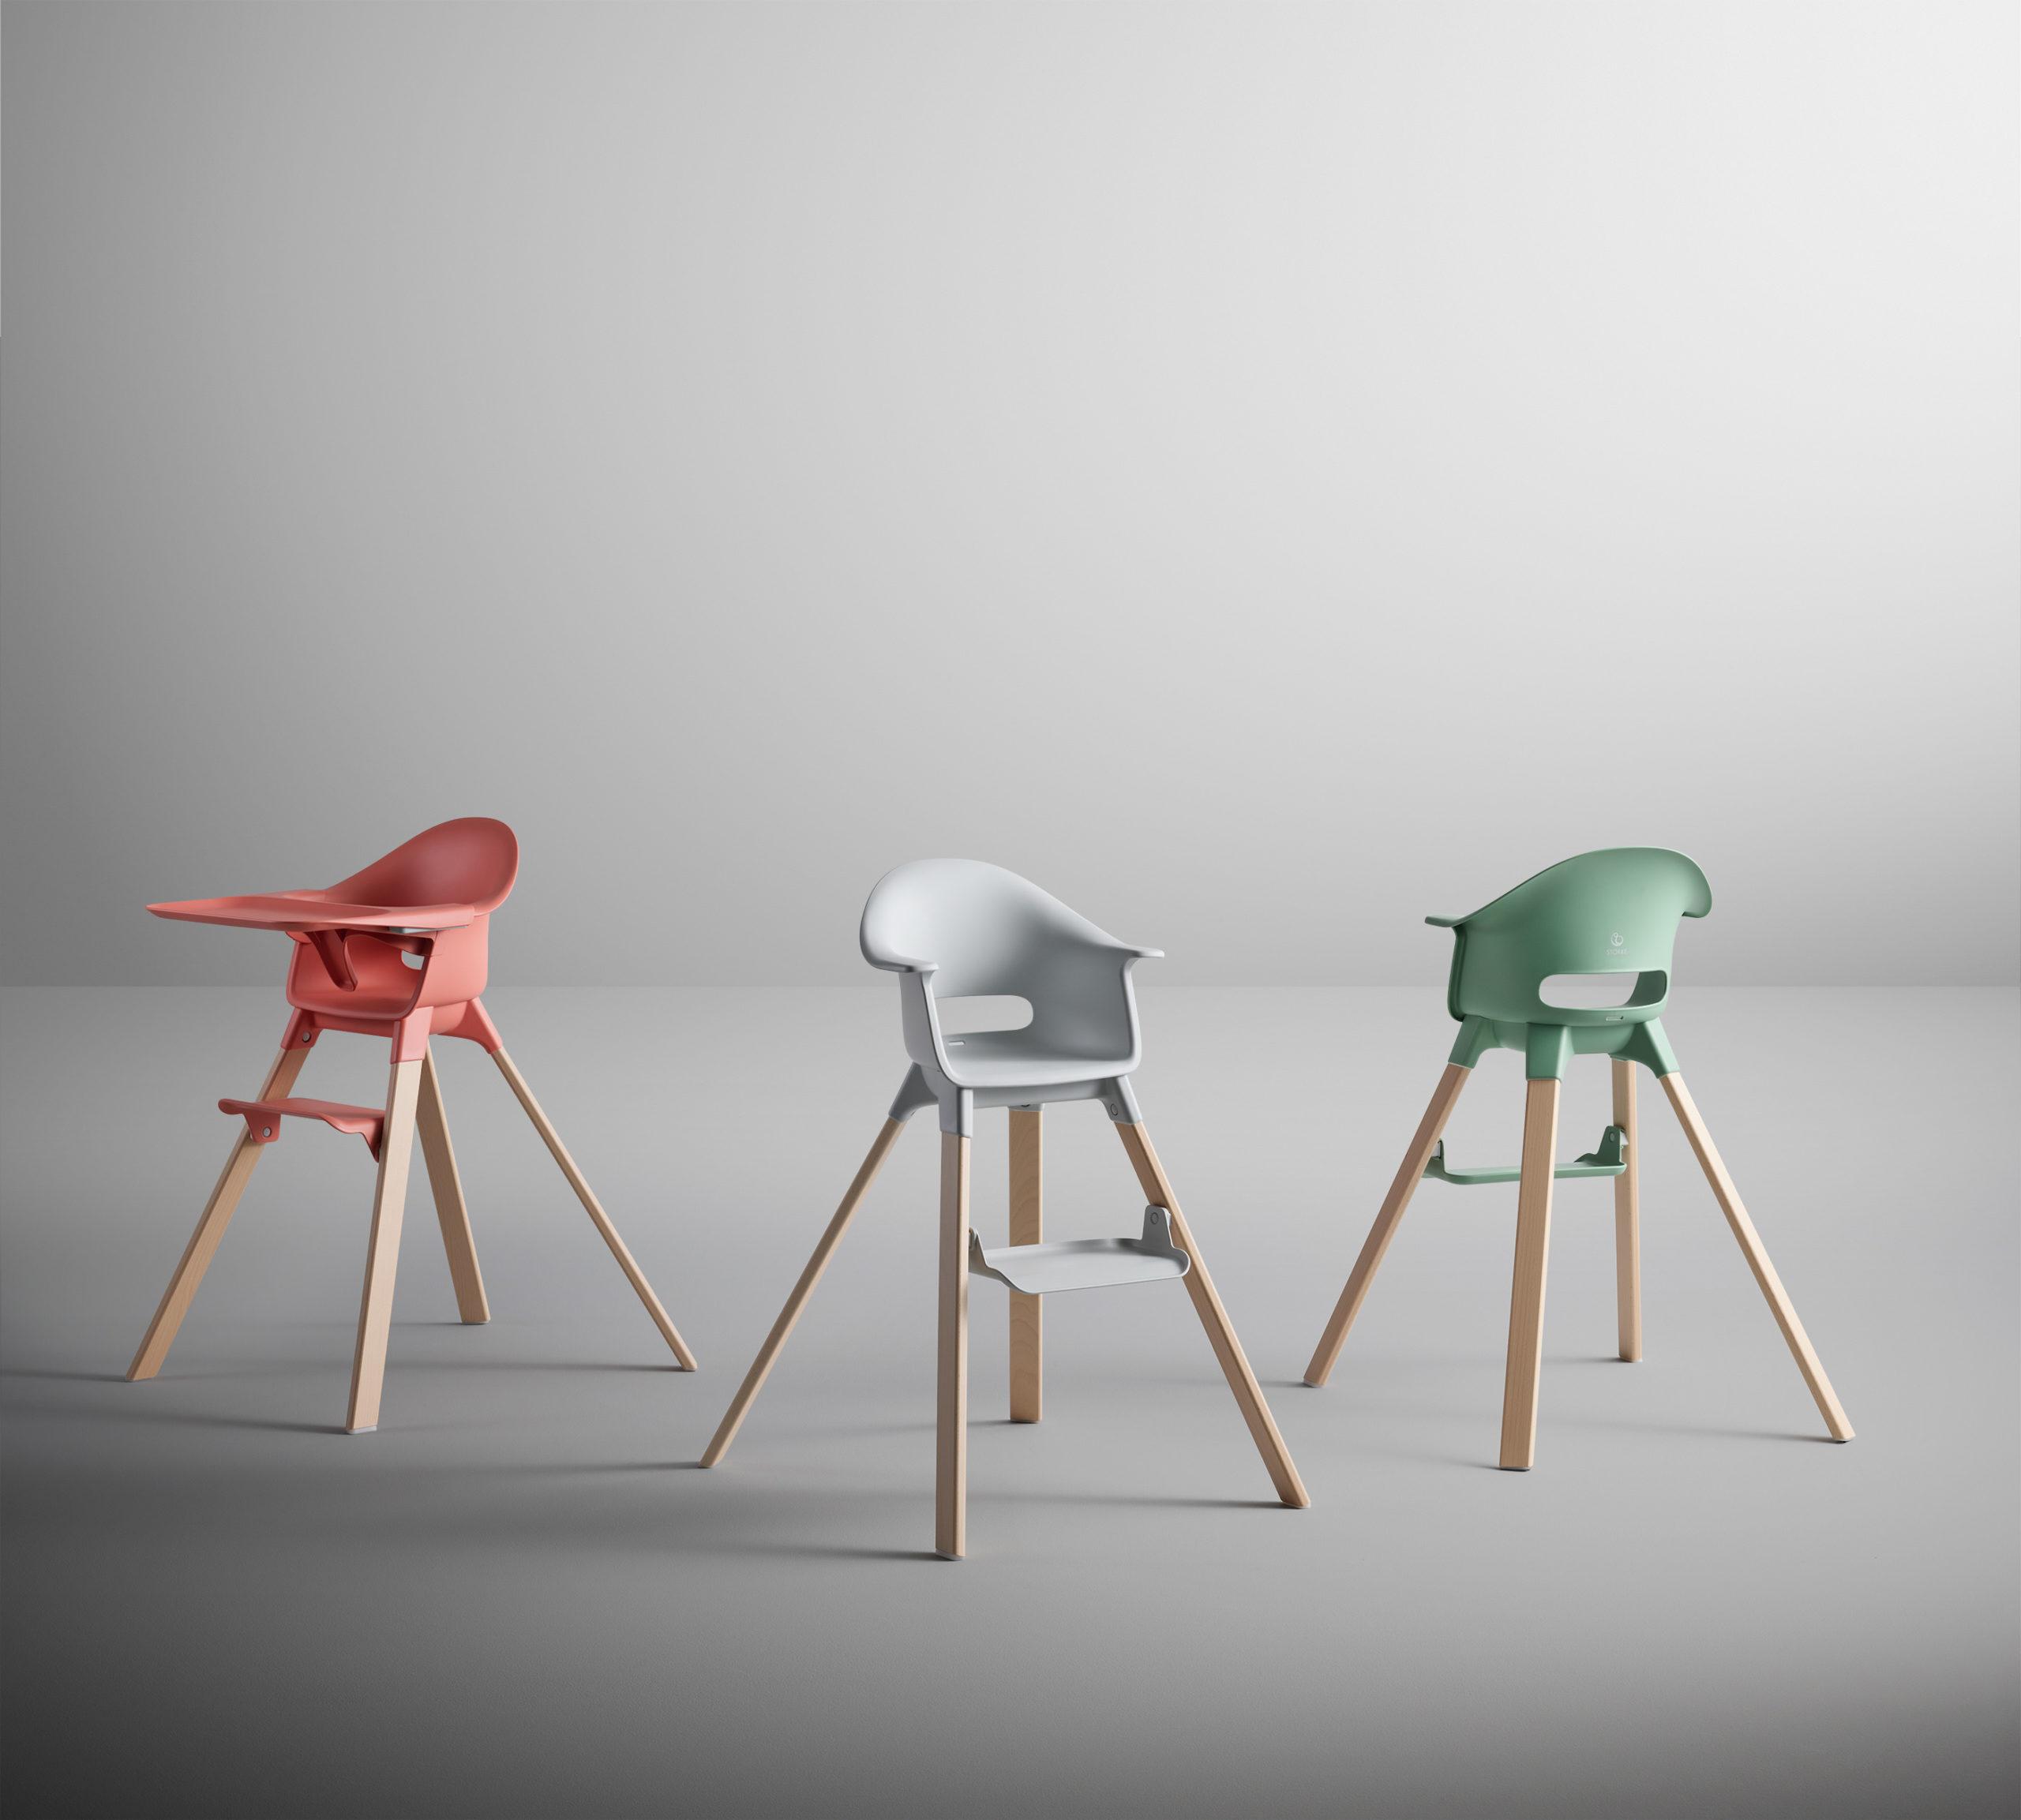 Stokke Clikk la chaise haute par le studio Permafrost